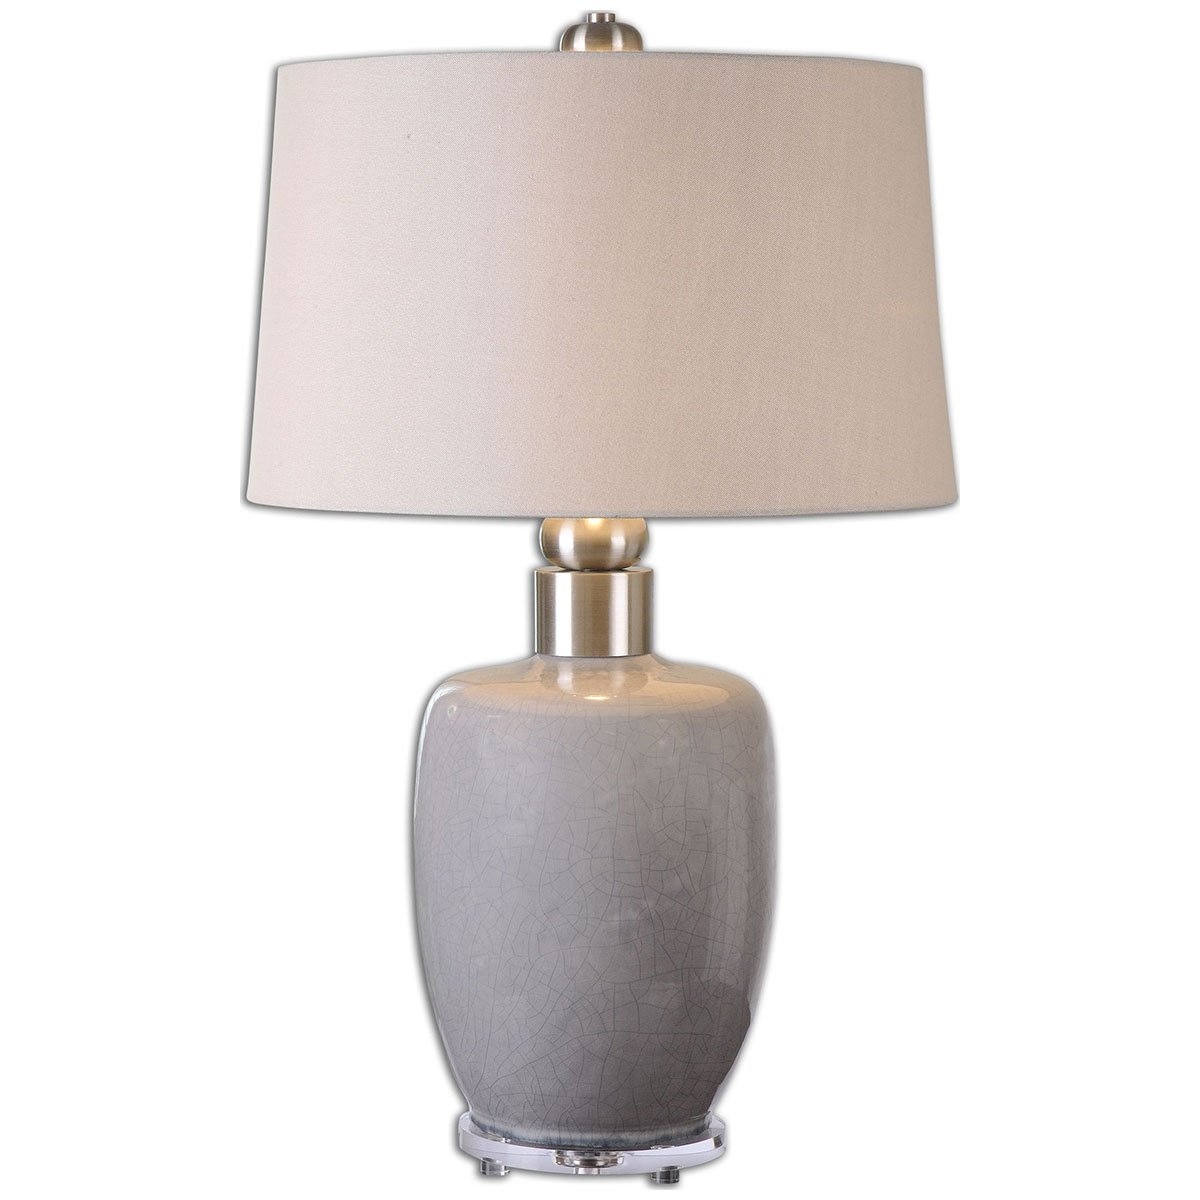 Uttermost 26147 Ovidius Glaze Lamp, Gray by Uttermost B00MK7V3U2